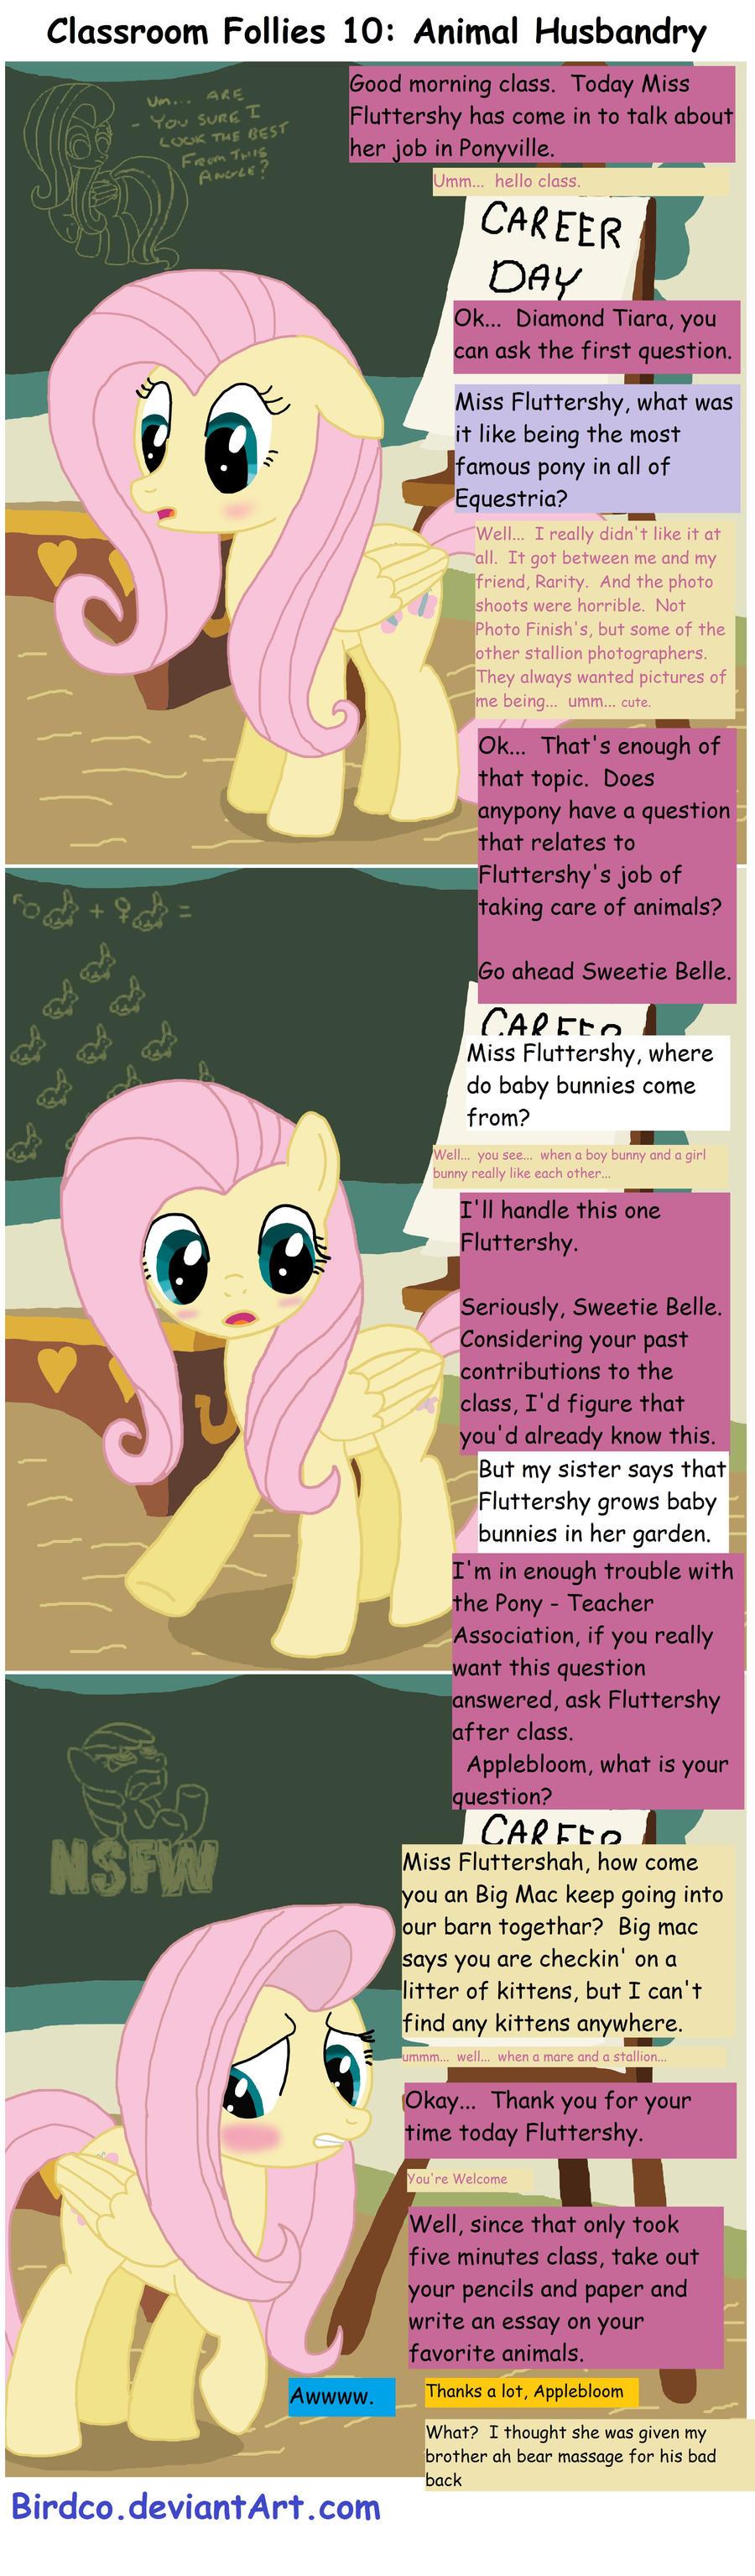 Classroom Follies 10 by Birdco